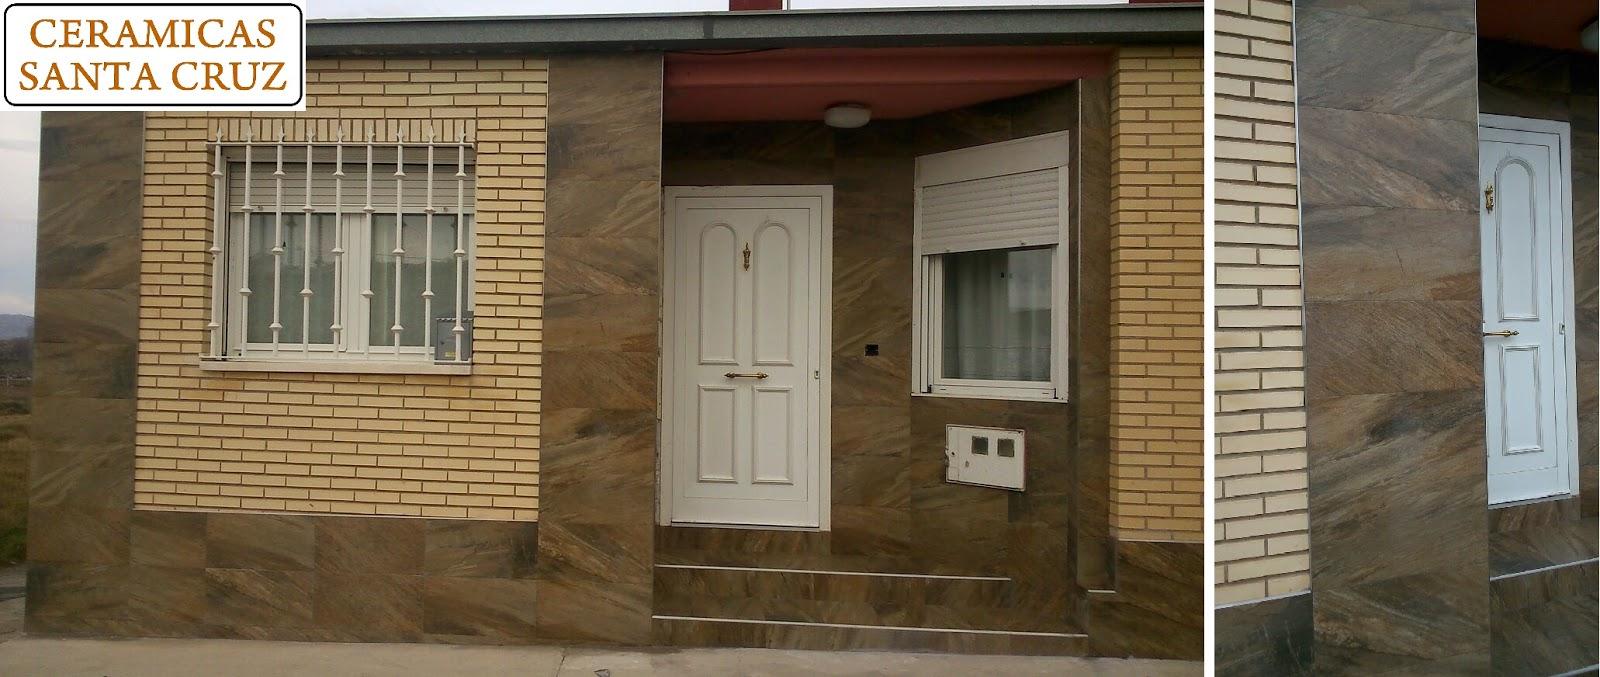 Ceramicas santa cruz reforma de fachada aplacada con for Ceramica para fachadas exteriores